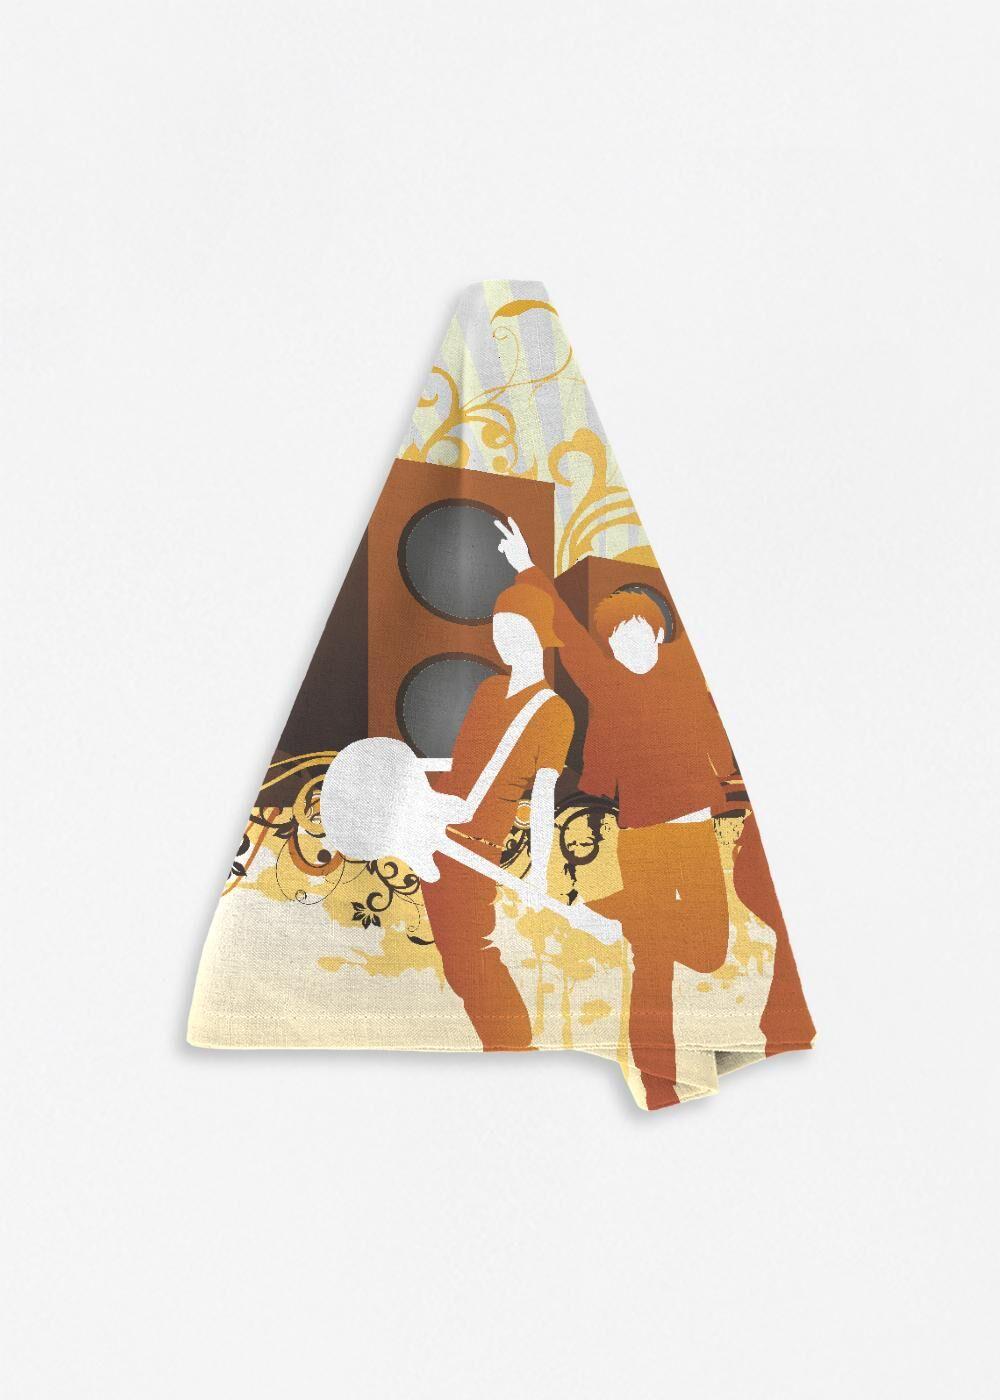 VIDA Napkin Set - Music Background by VIDA Original Artist  - Size: Set of 4